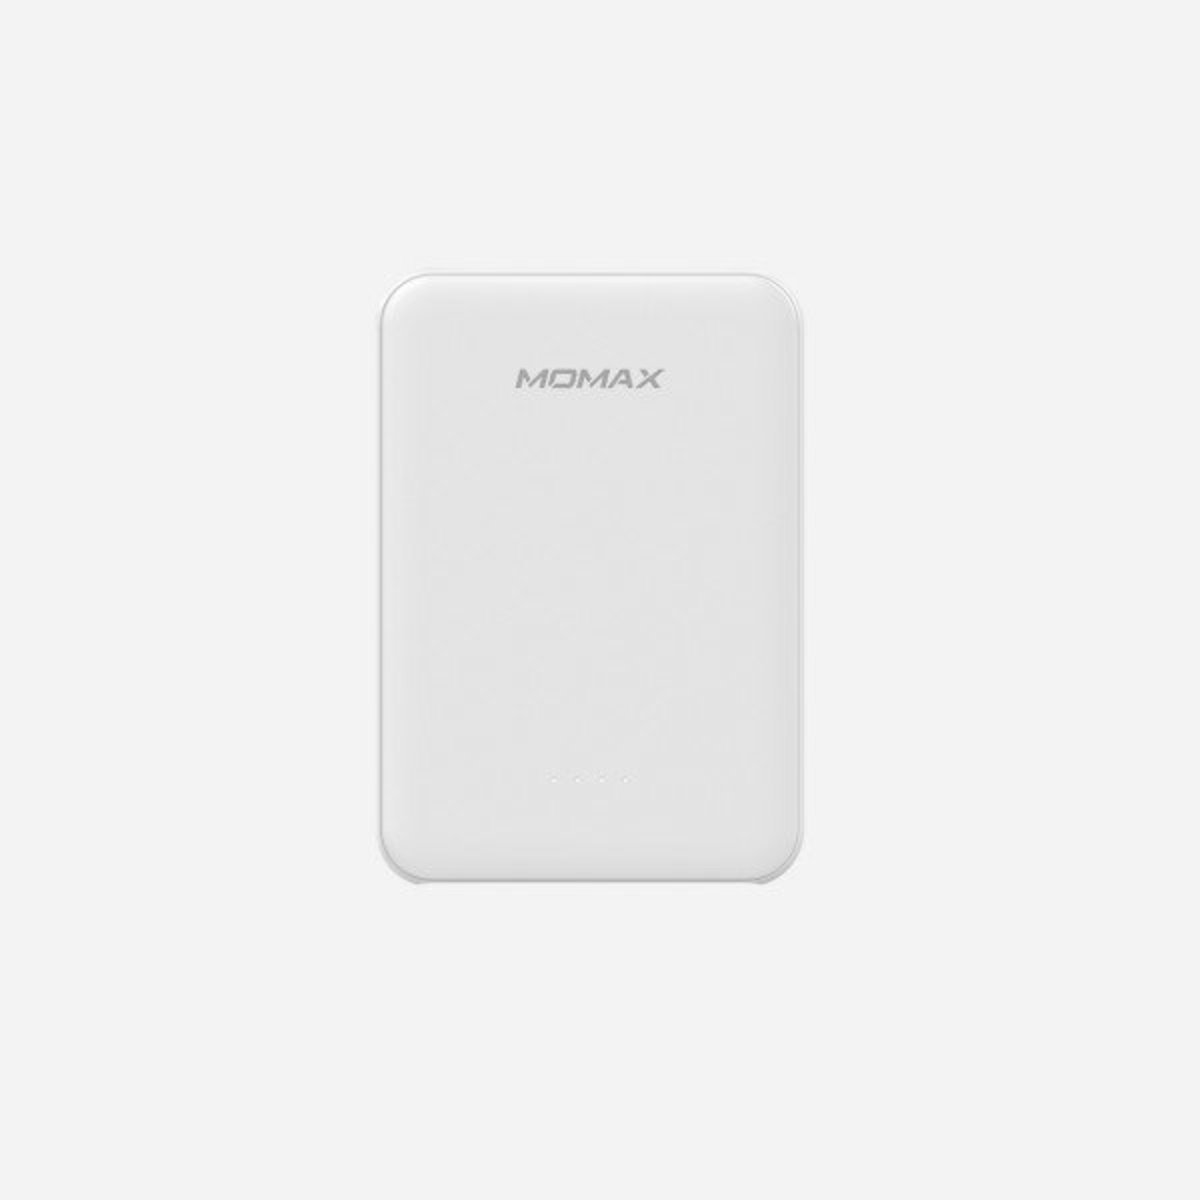 iPower Card 2 External Battery Pack[IP69][White][5000mAh]